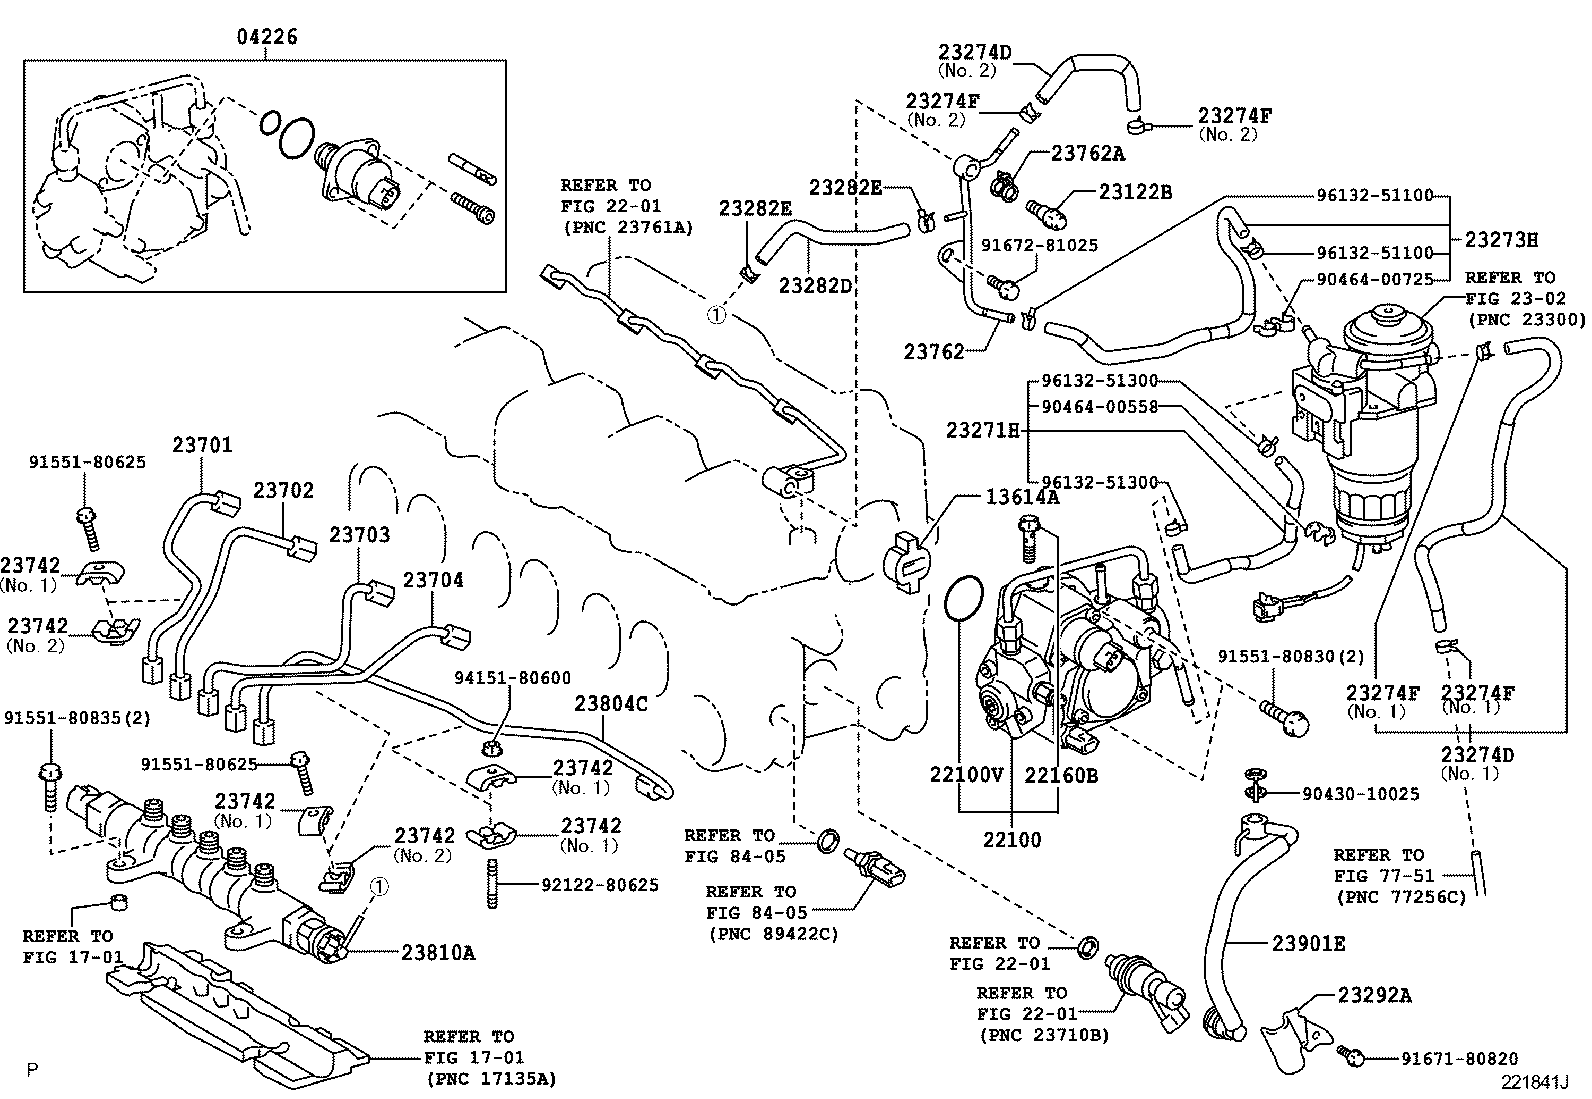 diagram of toyota rav4 engine usb front panel wiring